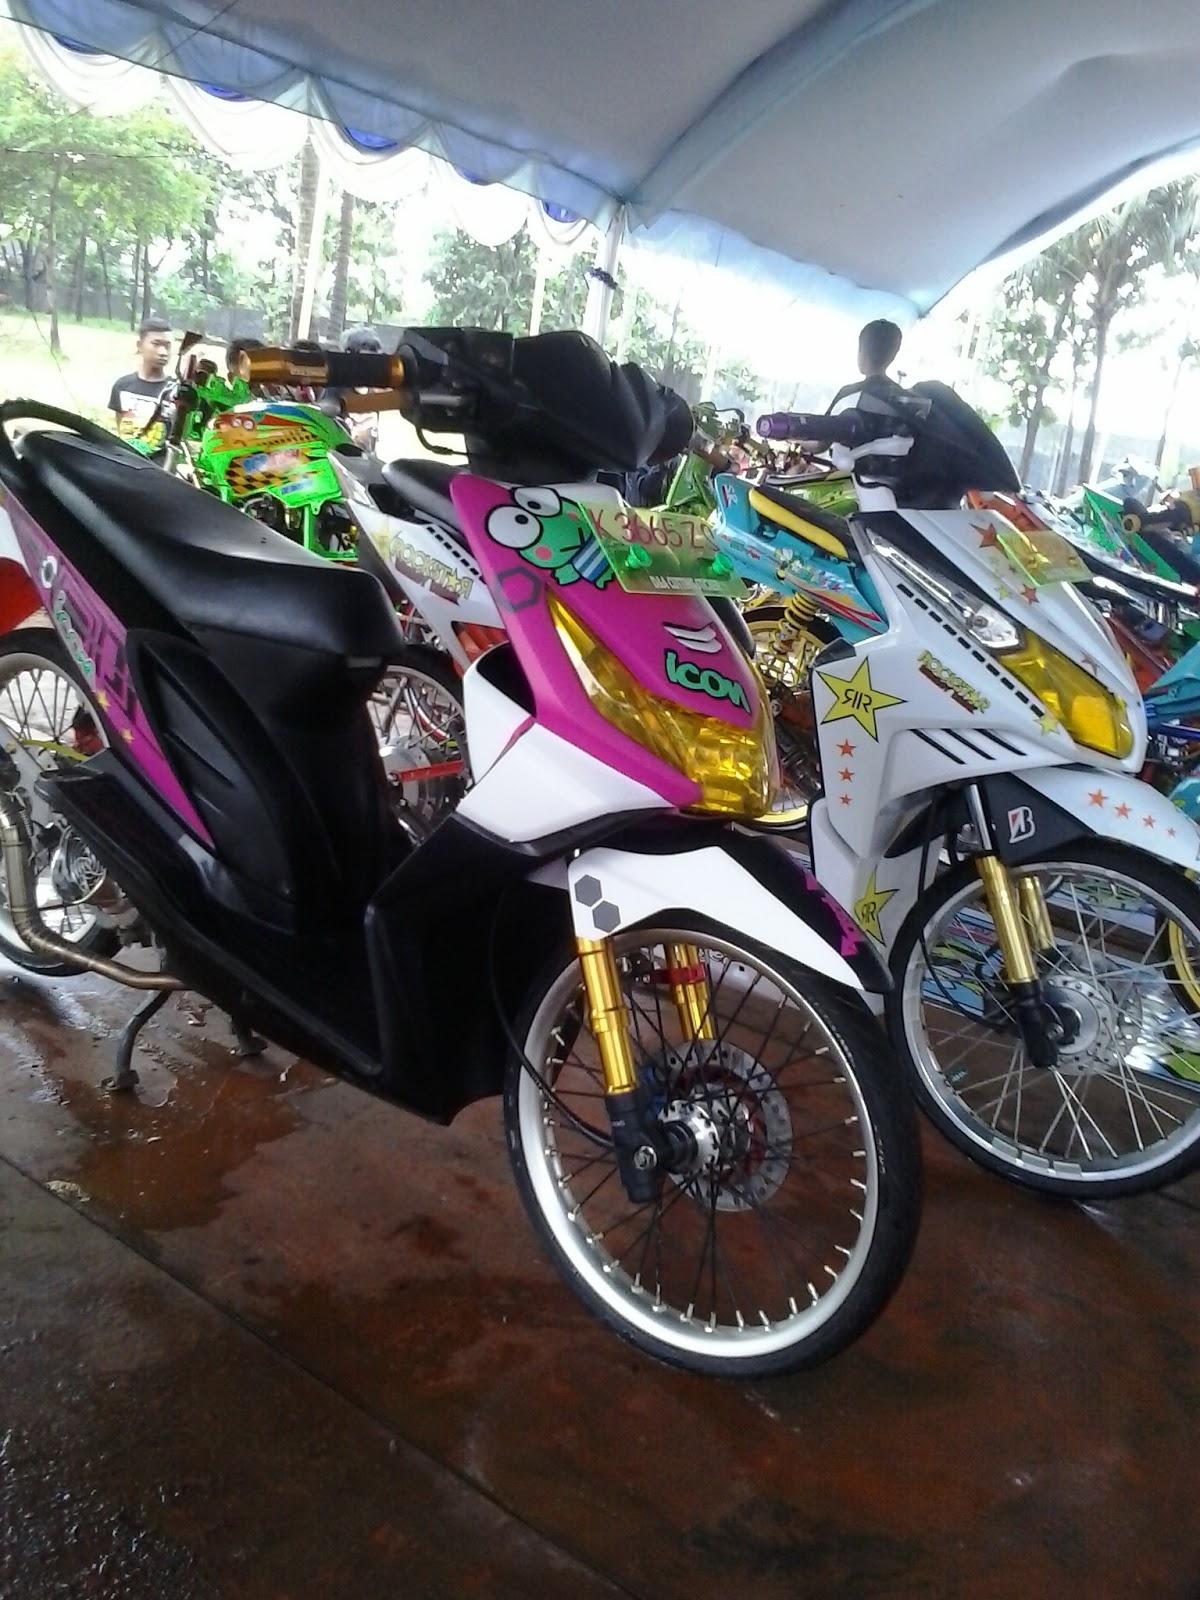 Modifikasi Motor Honda Beat 2010  modif kontes  kumpulan